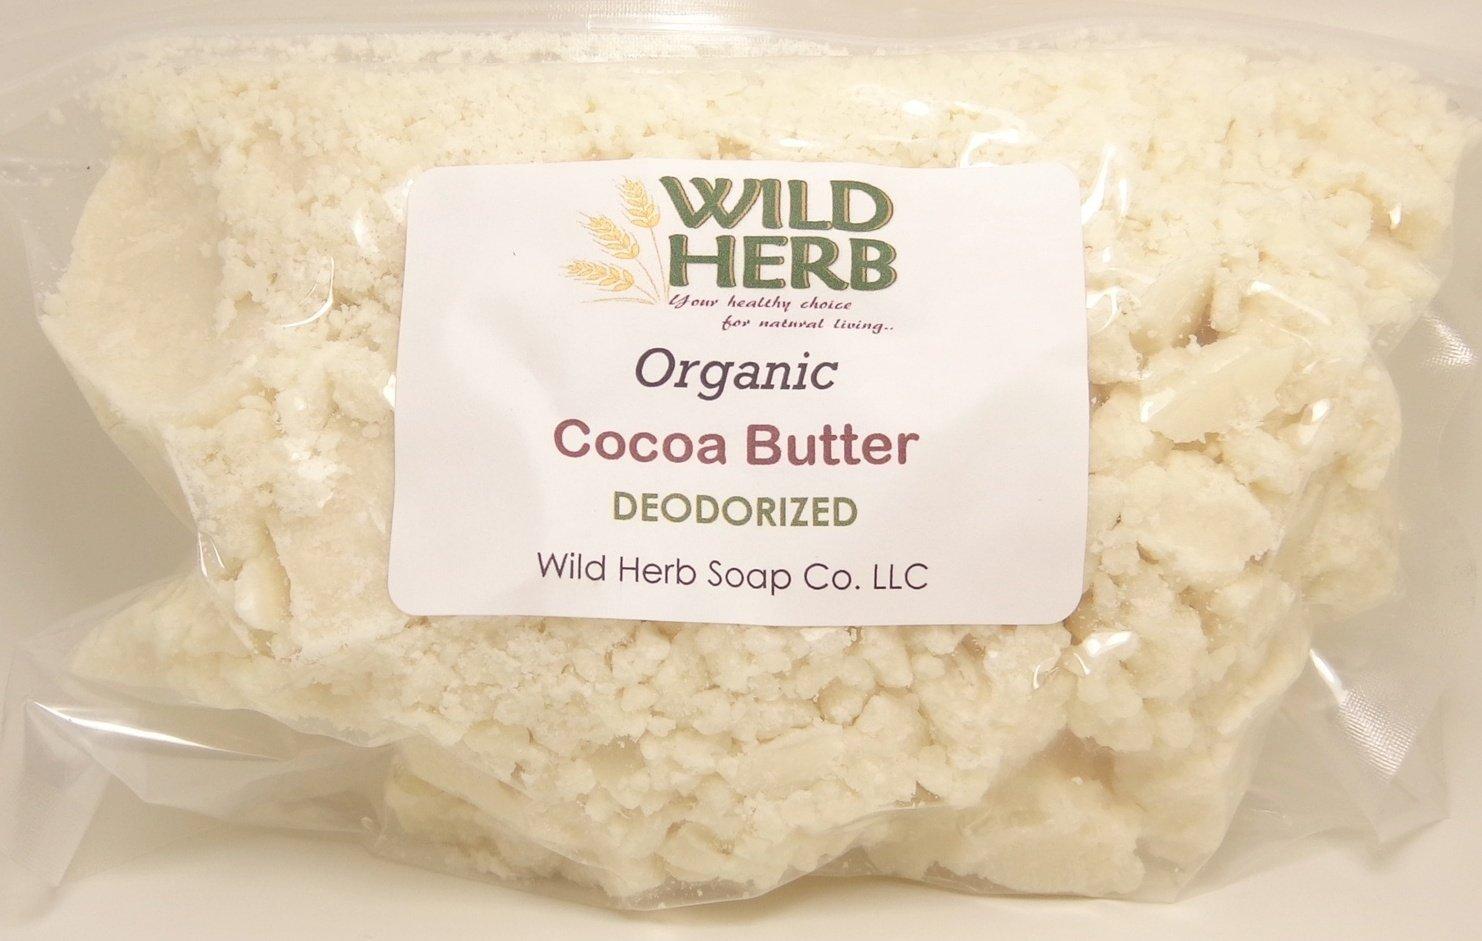 Deodorized Cocoa Butter Organic (15 lbs)